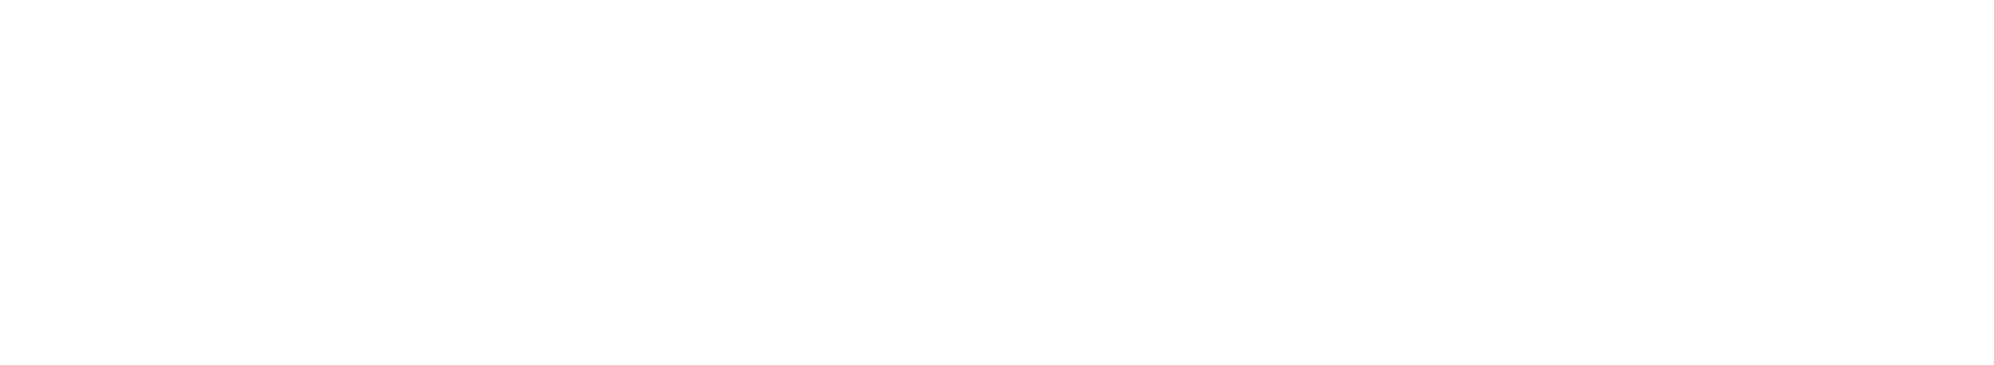 https://solidproof.io/storage/logos/4dOPUdQl2JRwtULeU2cpQOA3skAdmajBLB8oFjc4.png